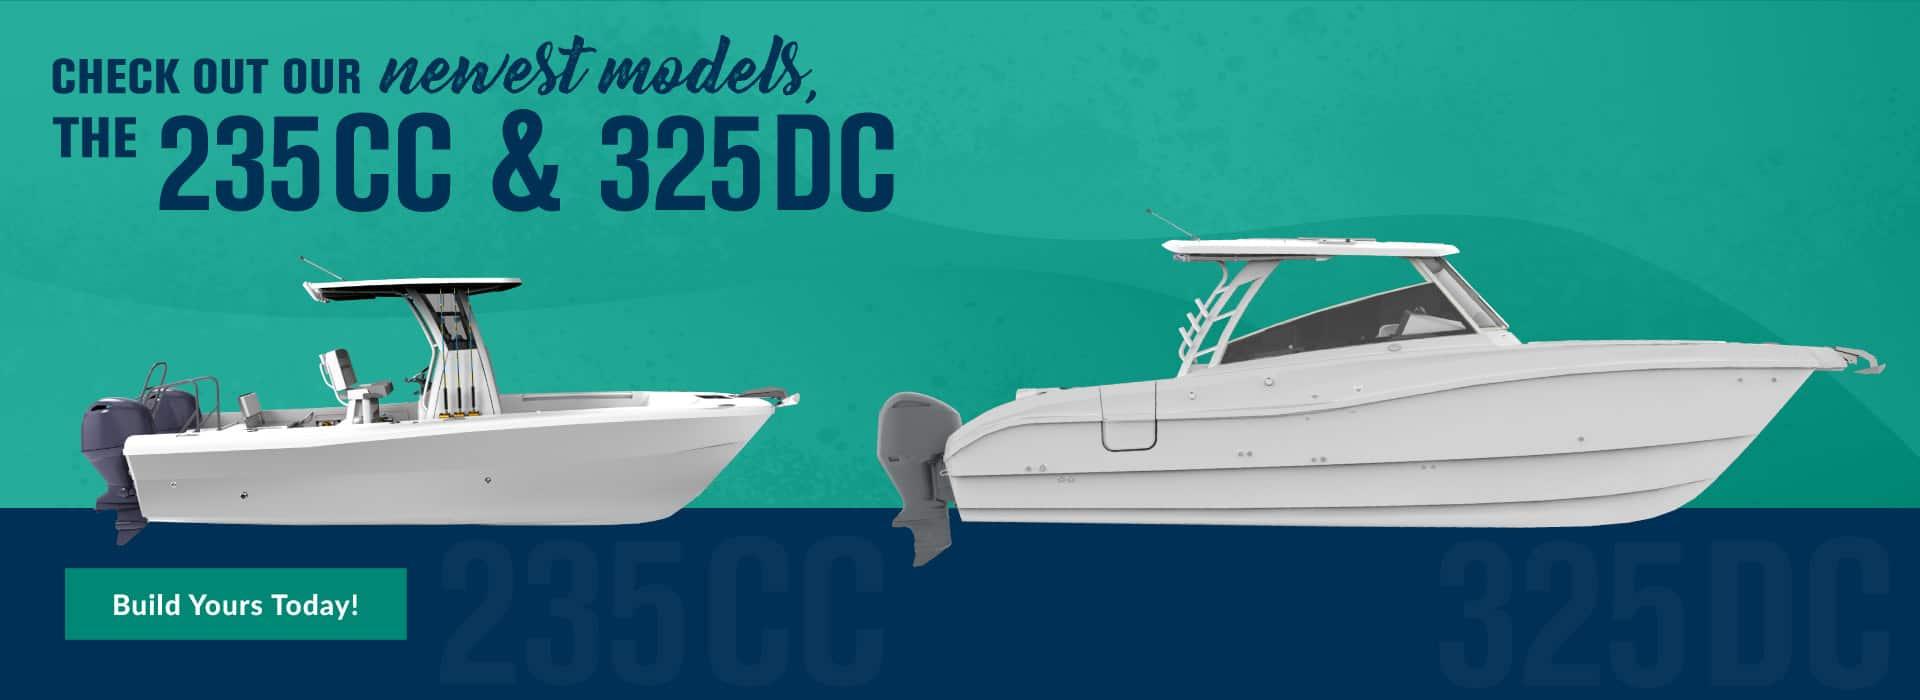 235CC & 325DC